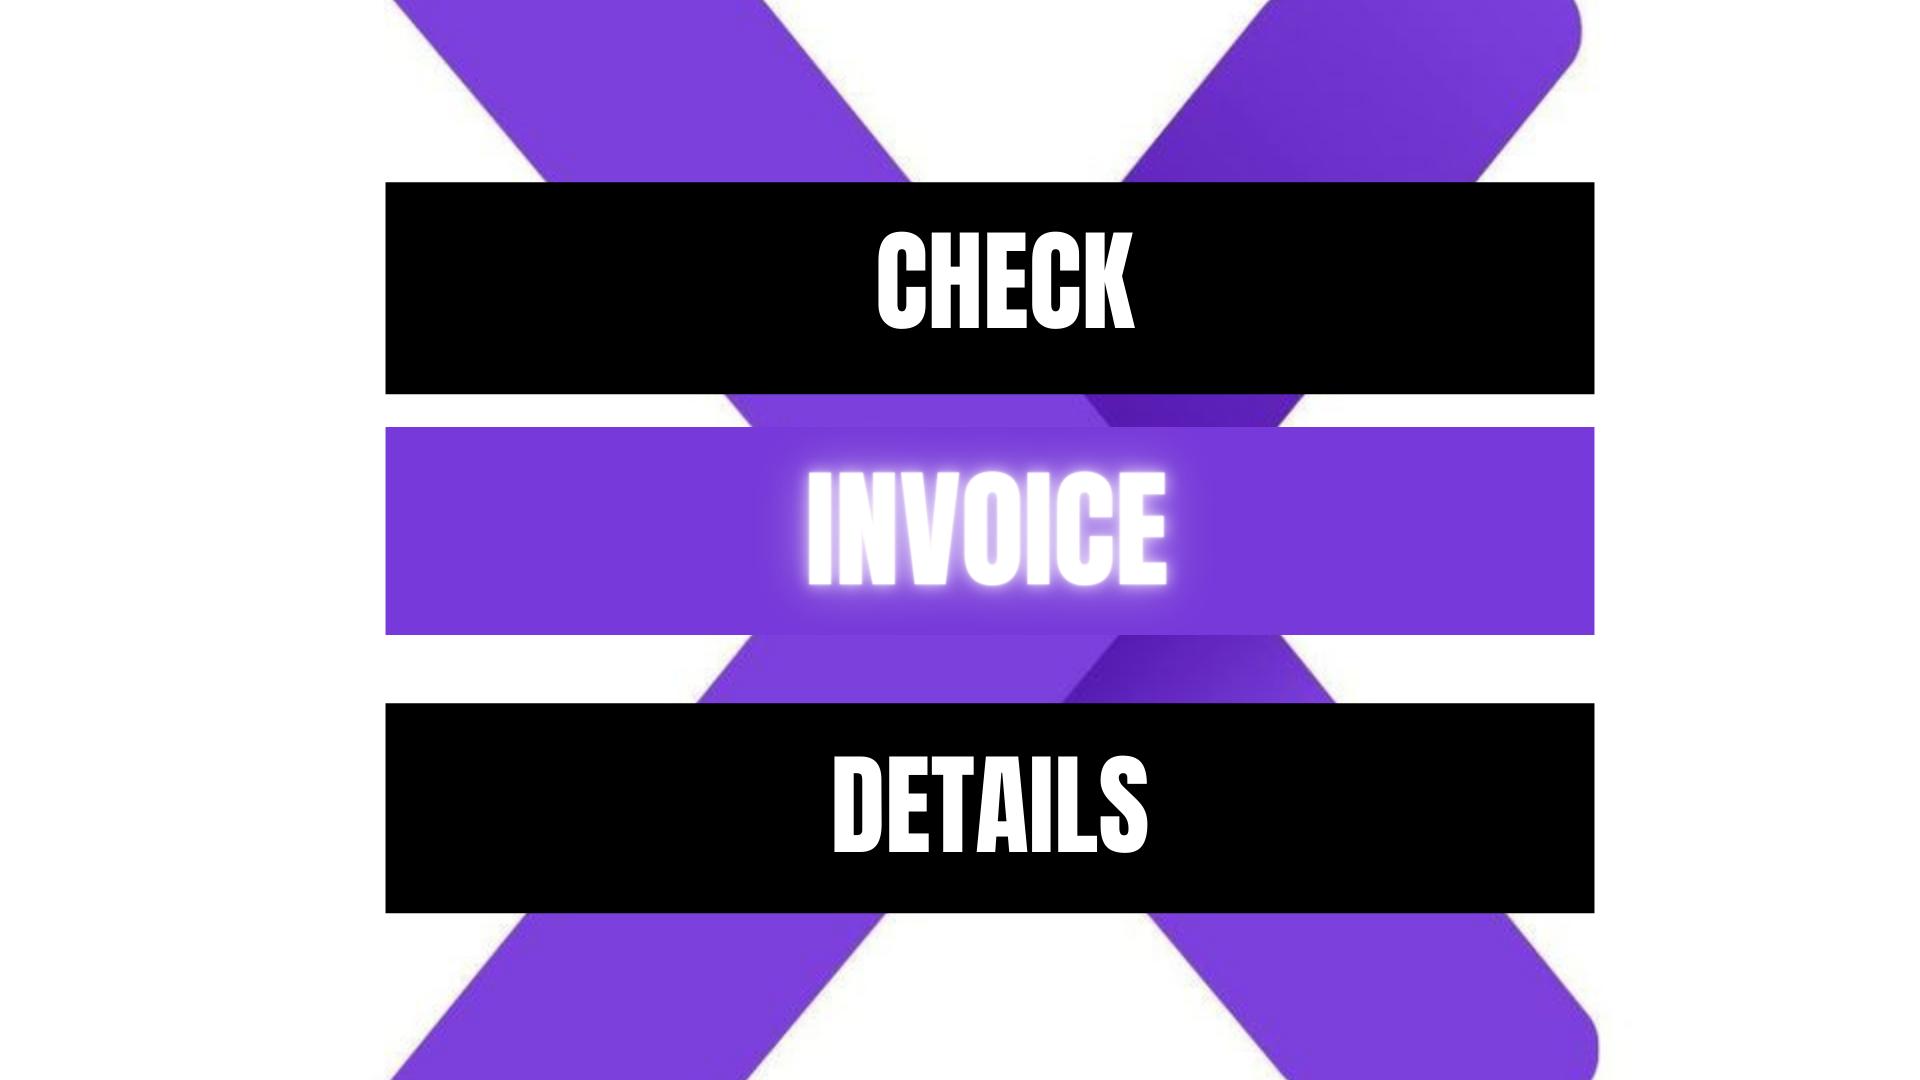 Peekaboox - Check Invoice Details